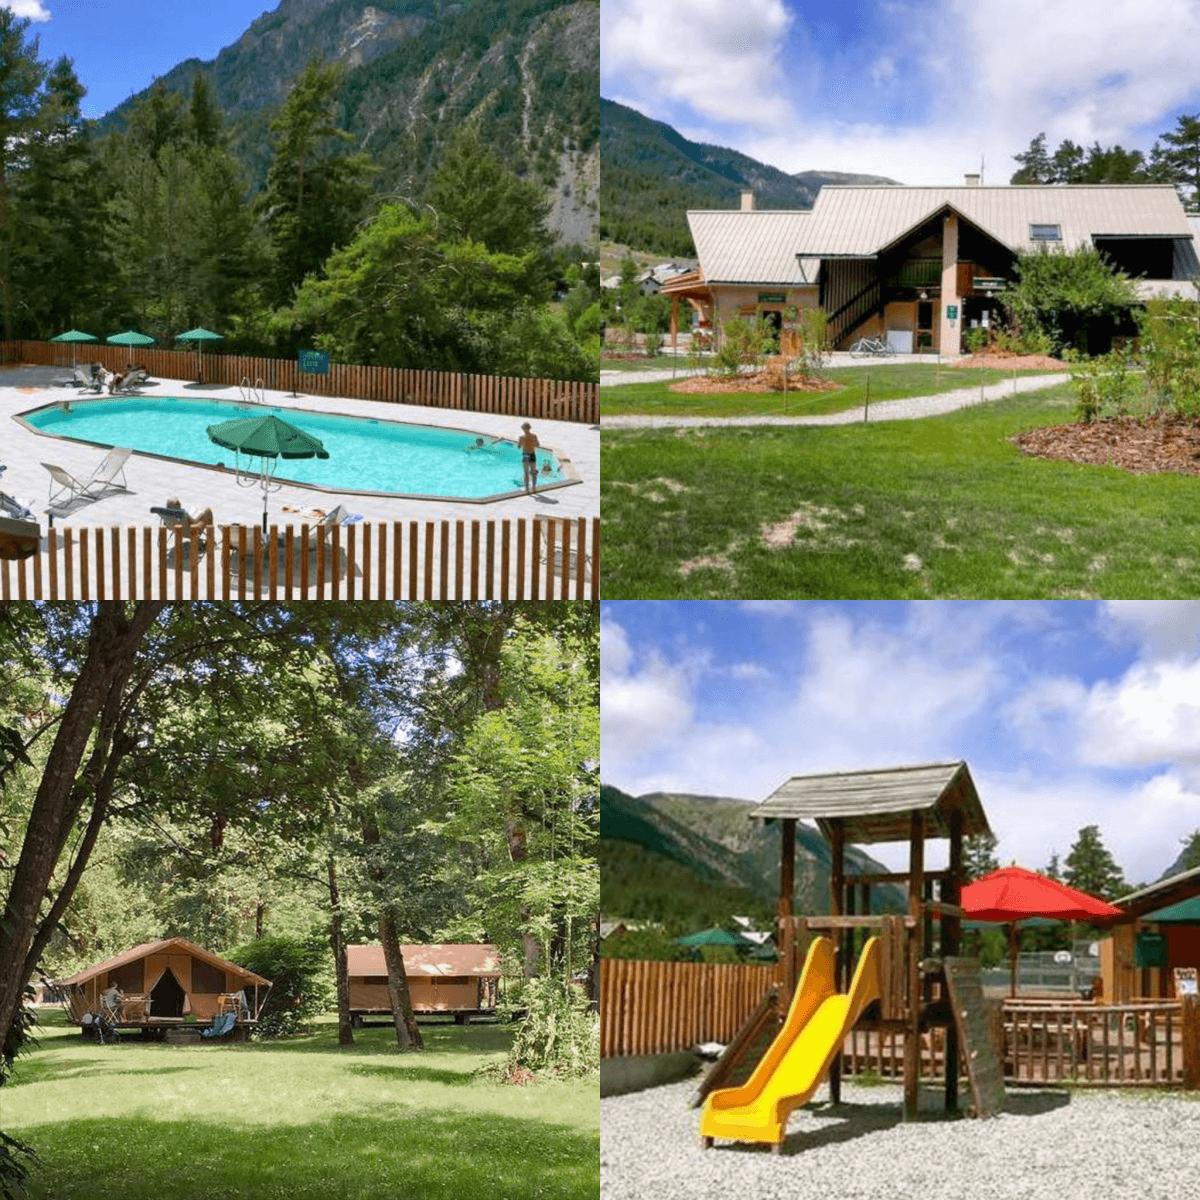 101 leuke idyllische campings in Frankrijk met kids #leukmetkids Camping Huttopia La Clarée, Val-des-Prés, bij Briançon, Provence-Alpes-Côte d'Azur